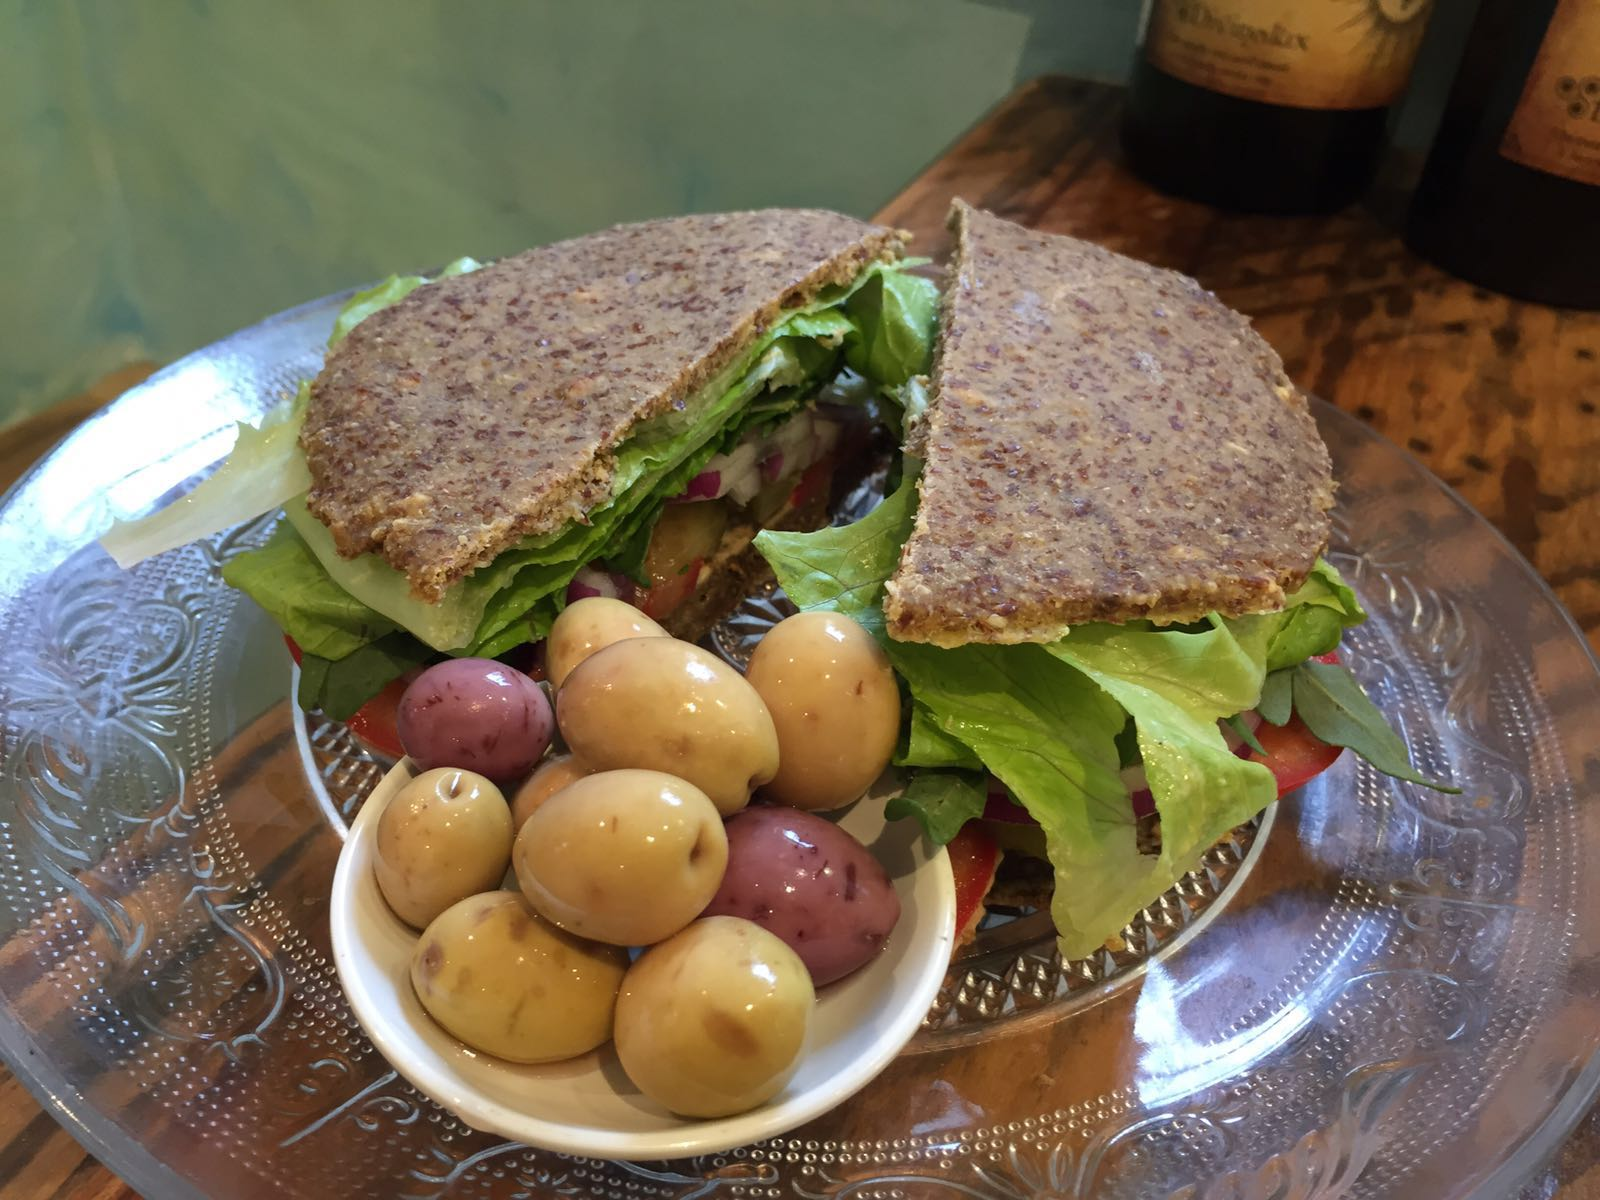 Vegan Gluten-free Burger